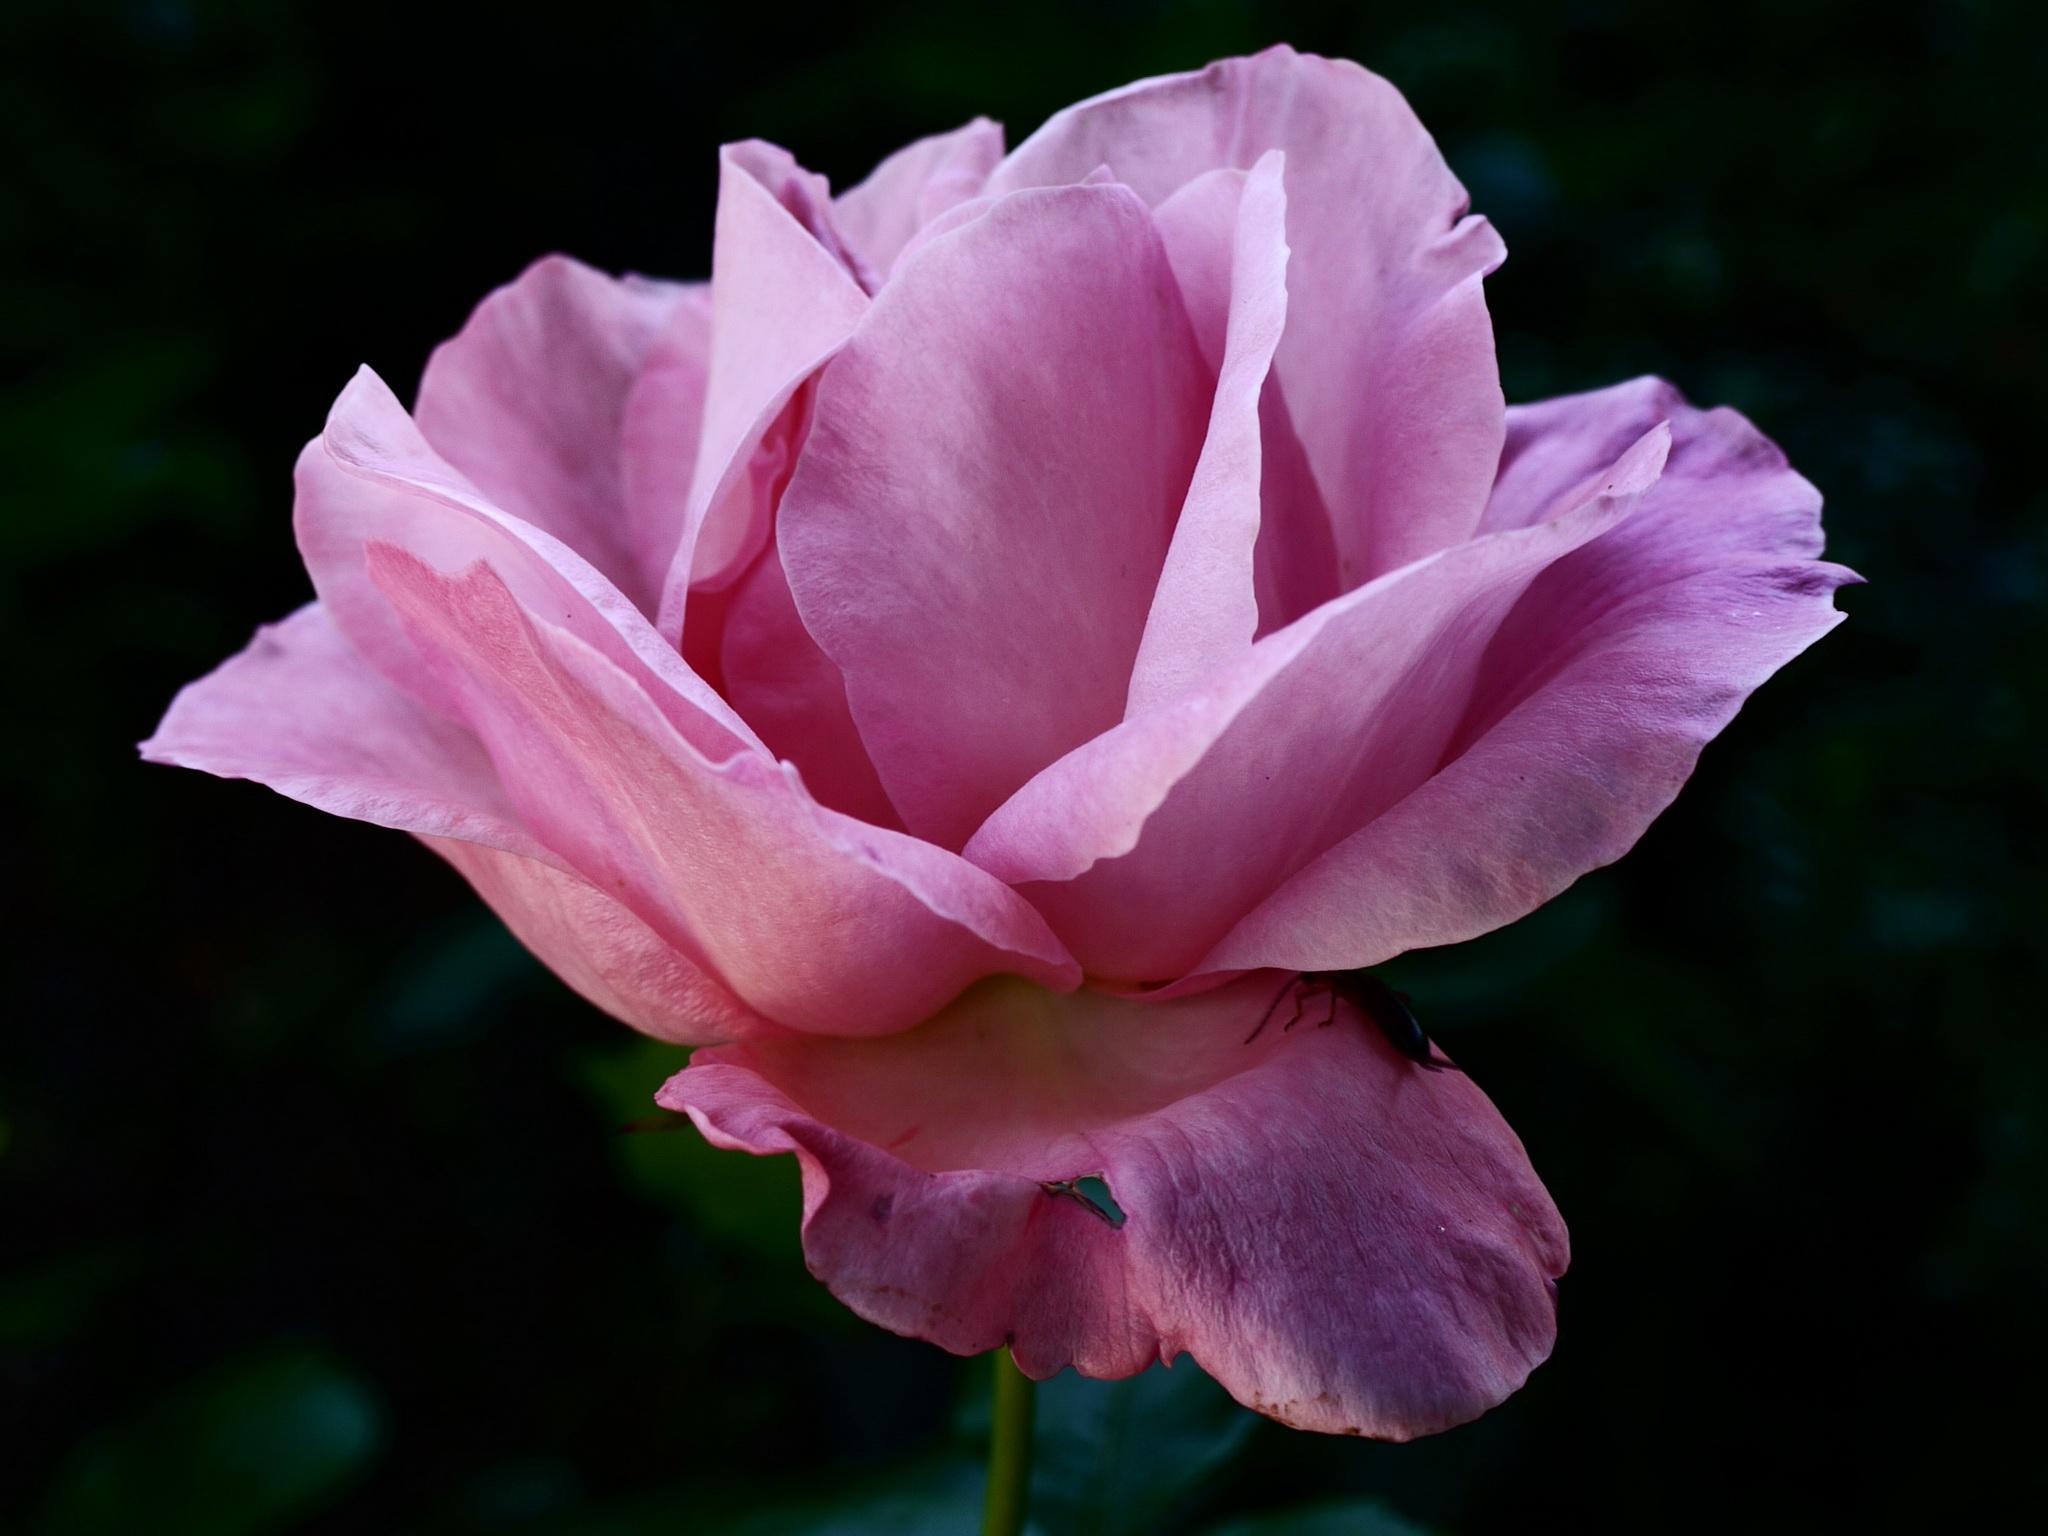 фиолетовый цветок фото: